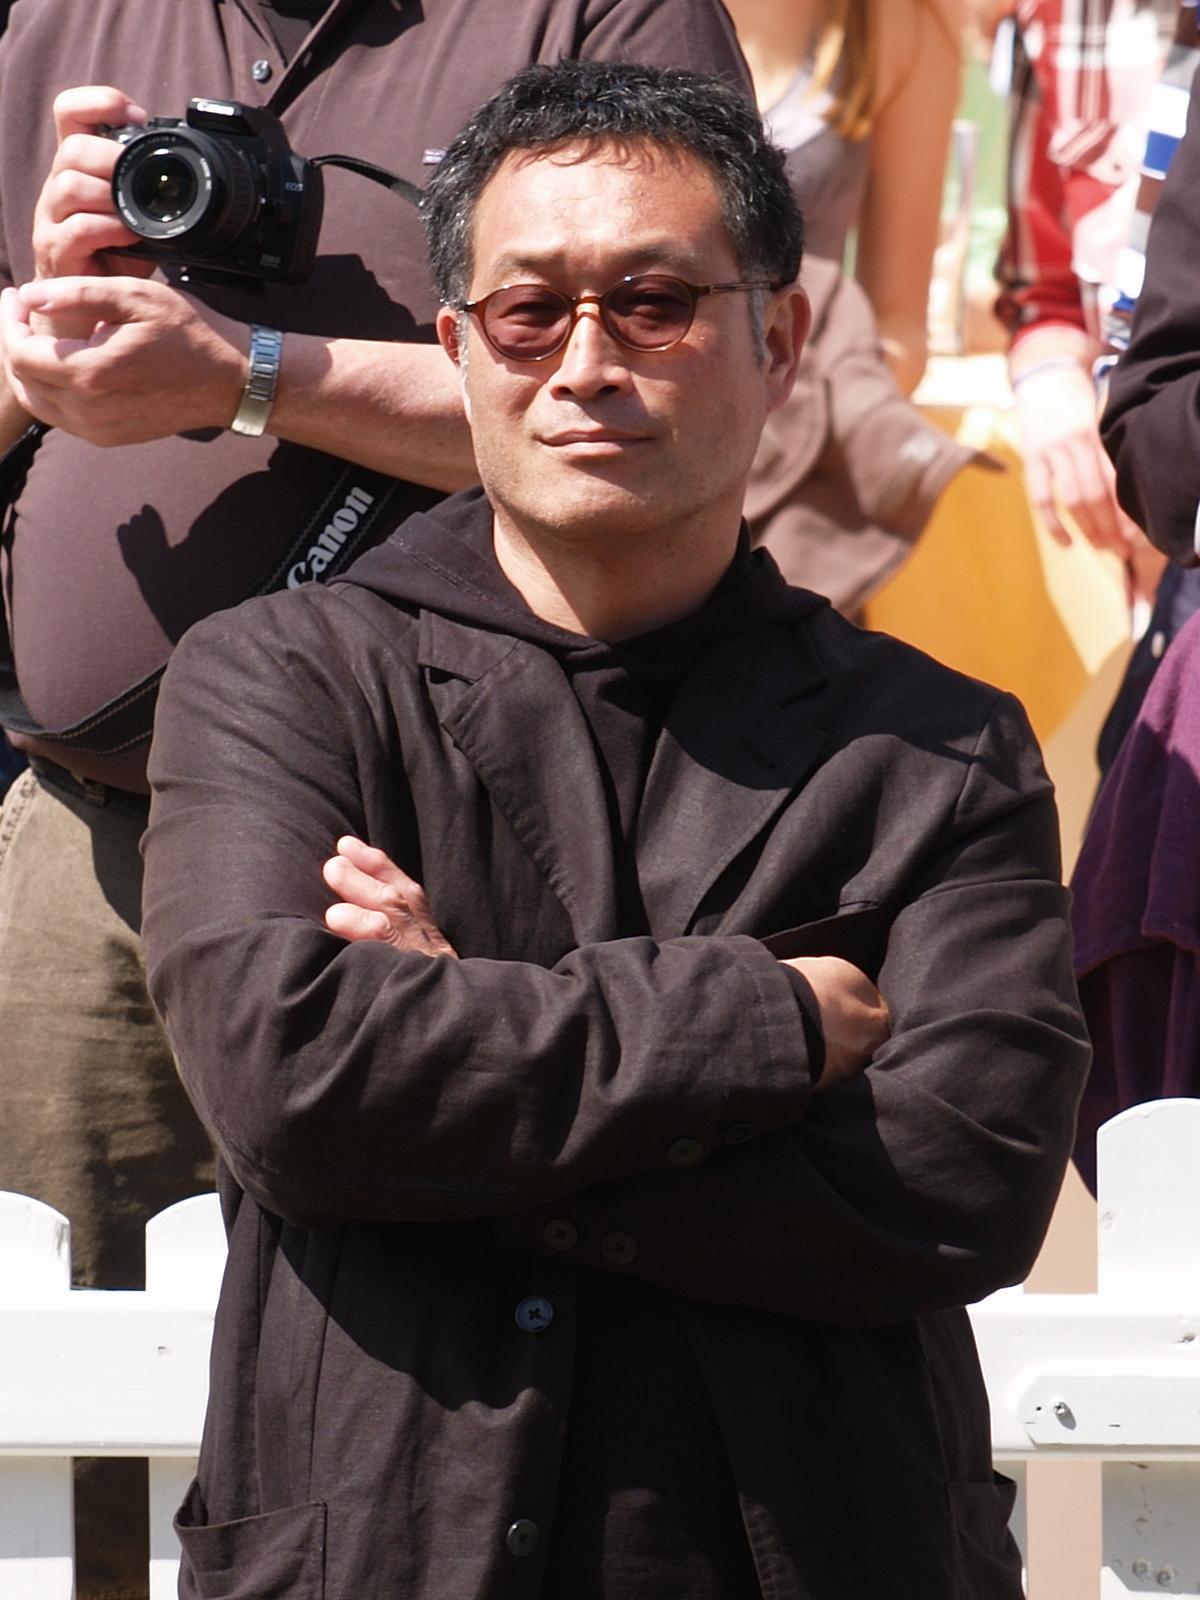 Image of Tadashi Kawamata from Wikidata